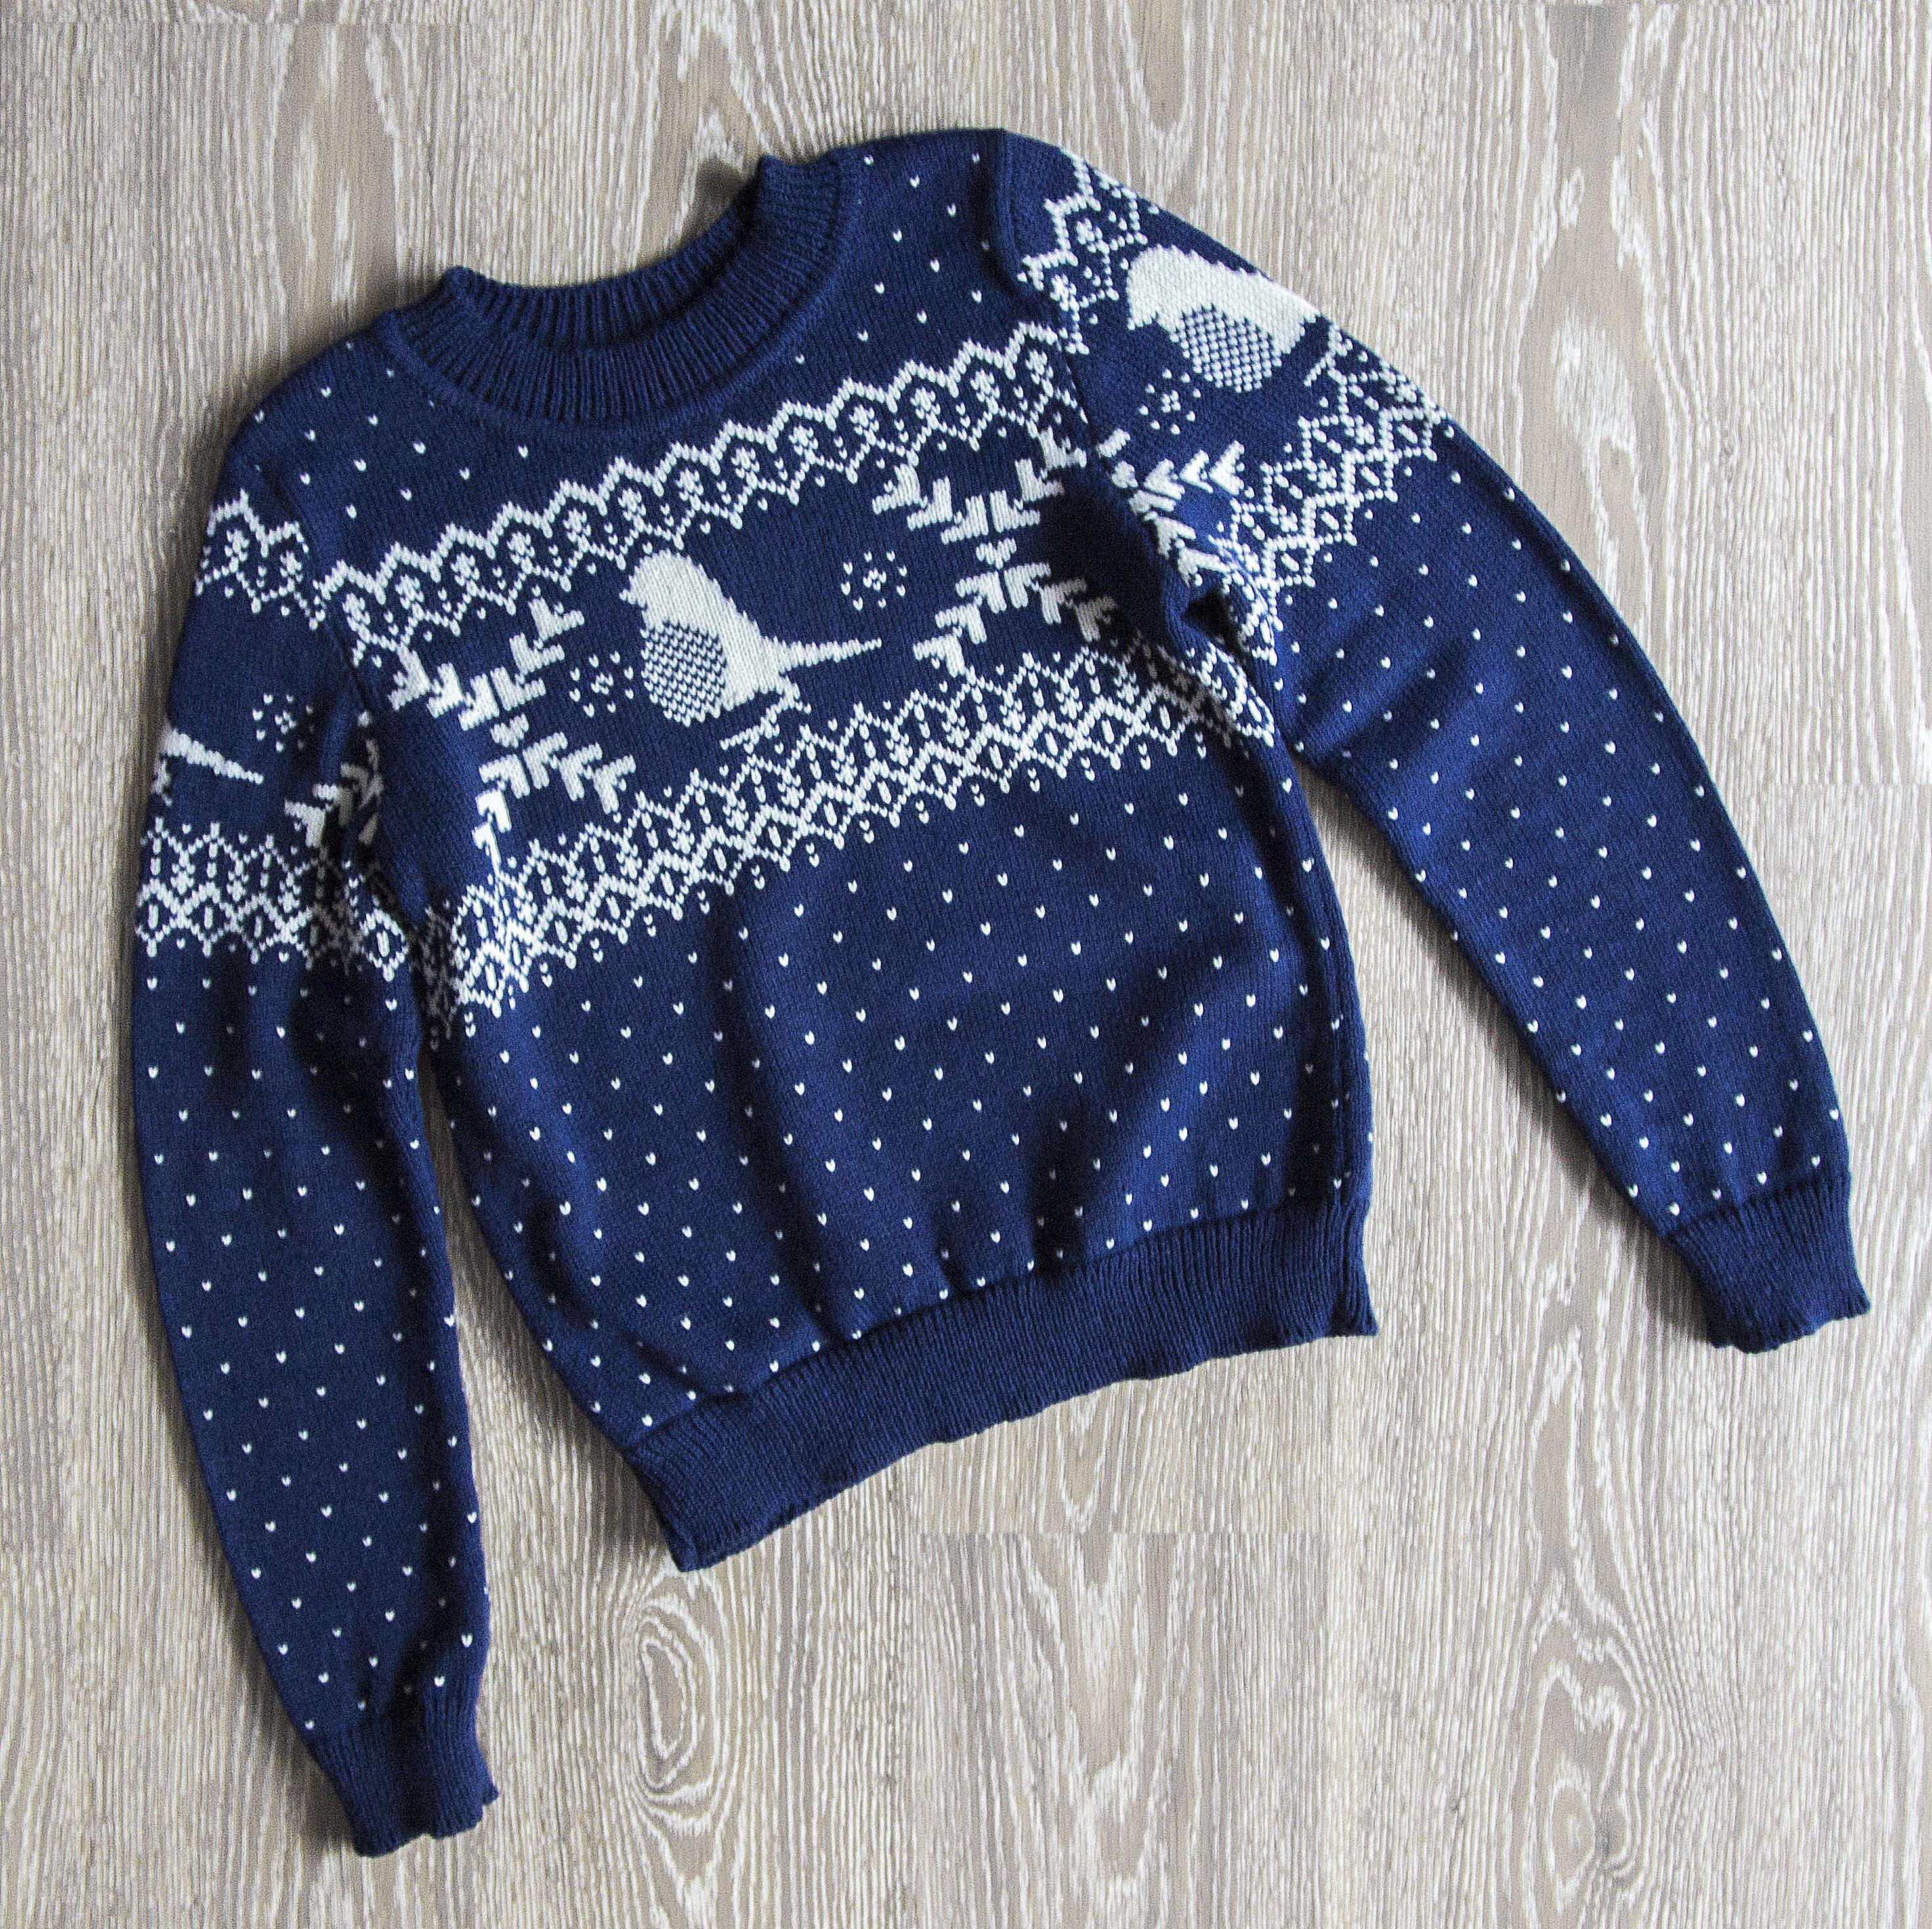 рождественский свитер с норвежским рисунком схема жакардо спицами детский